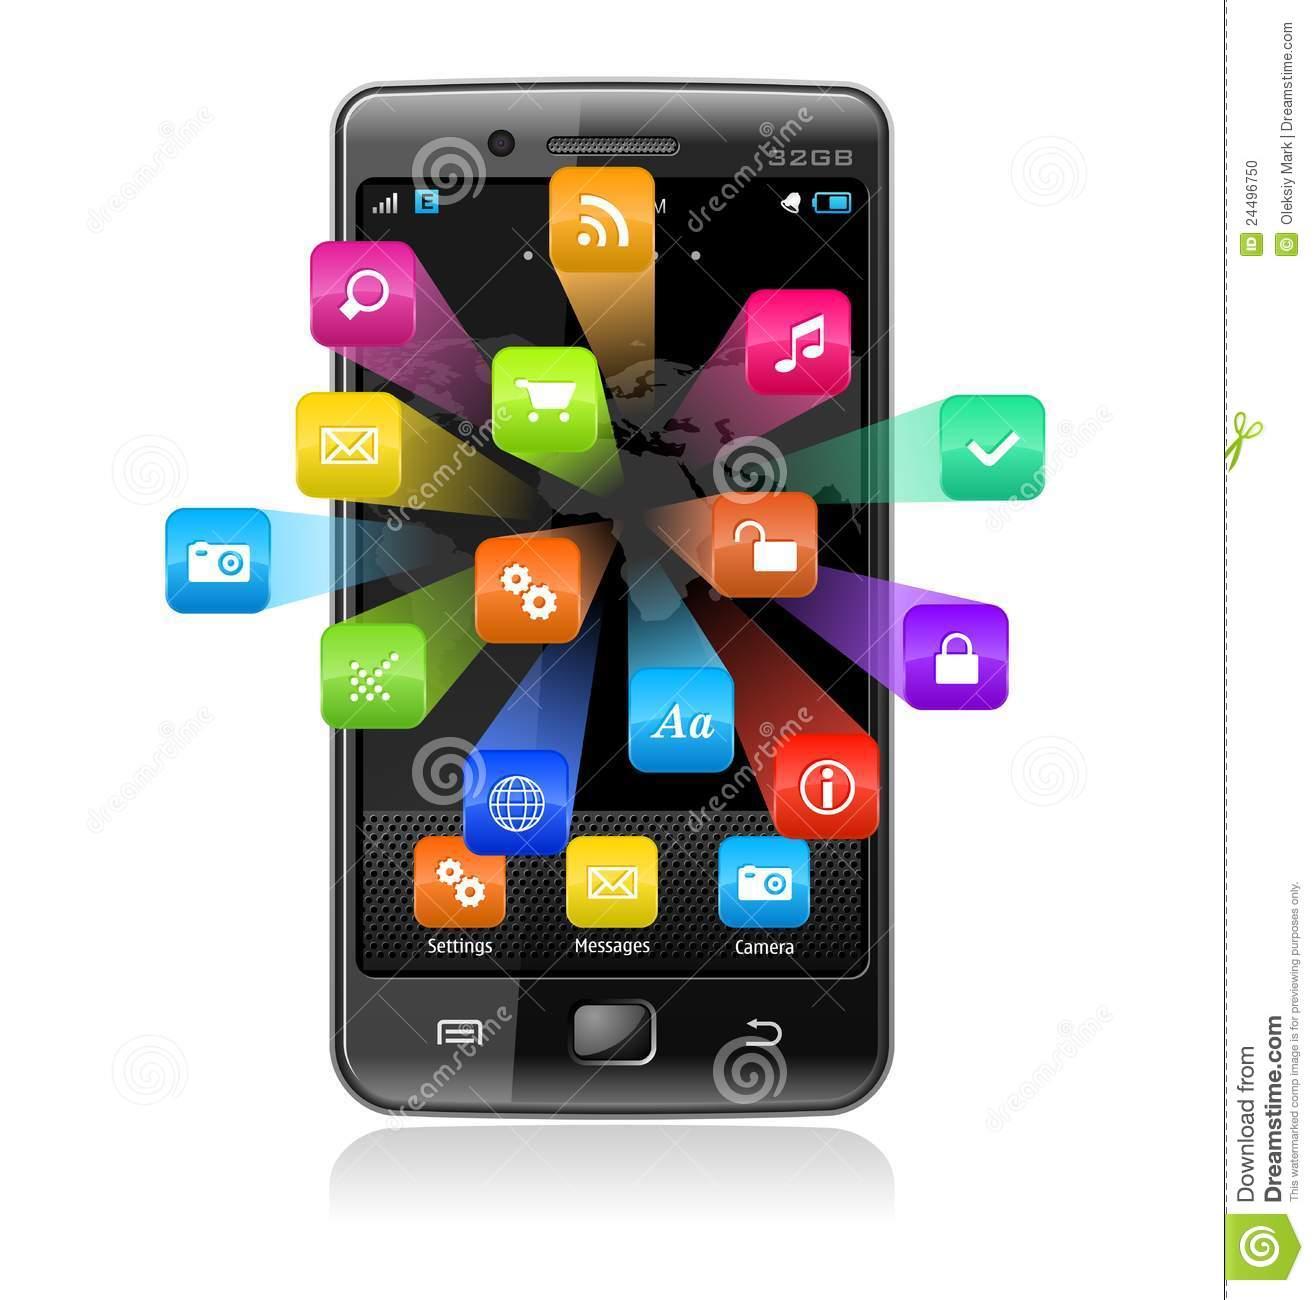 Phone app clipart clipart download Phone app clipart - ClipartFest clipart download